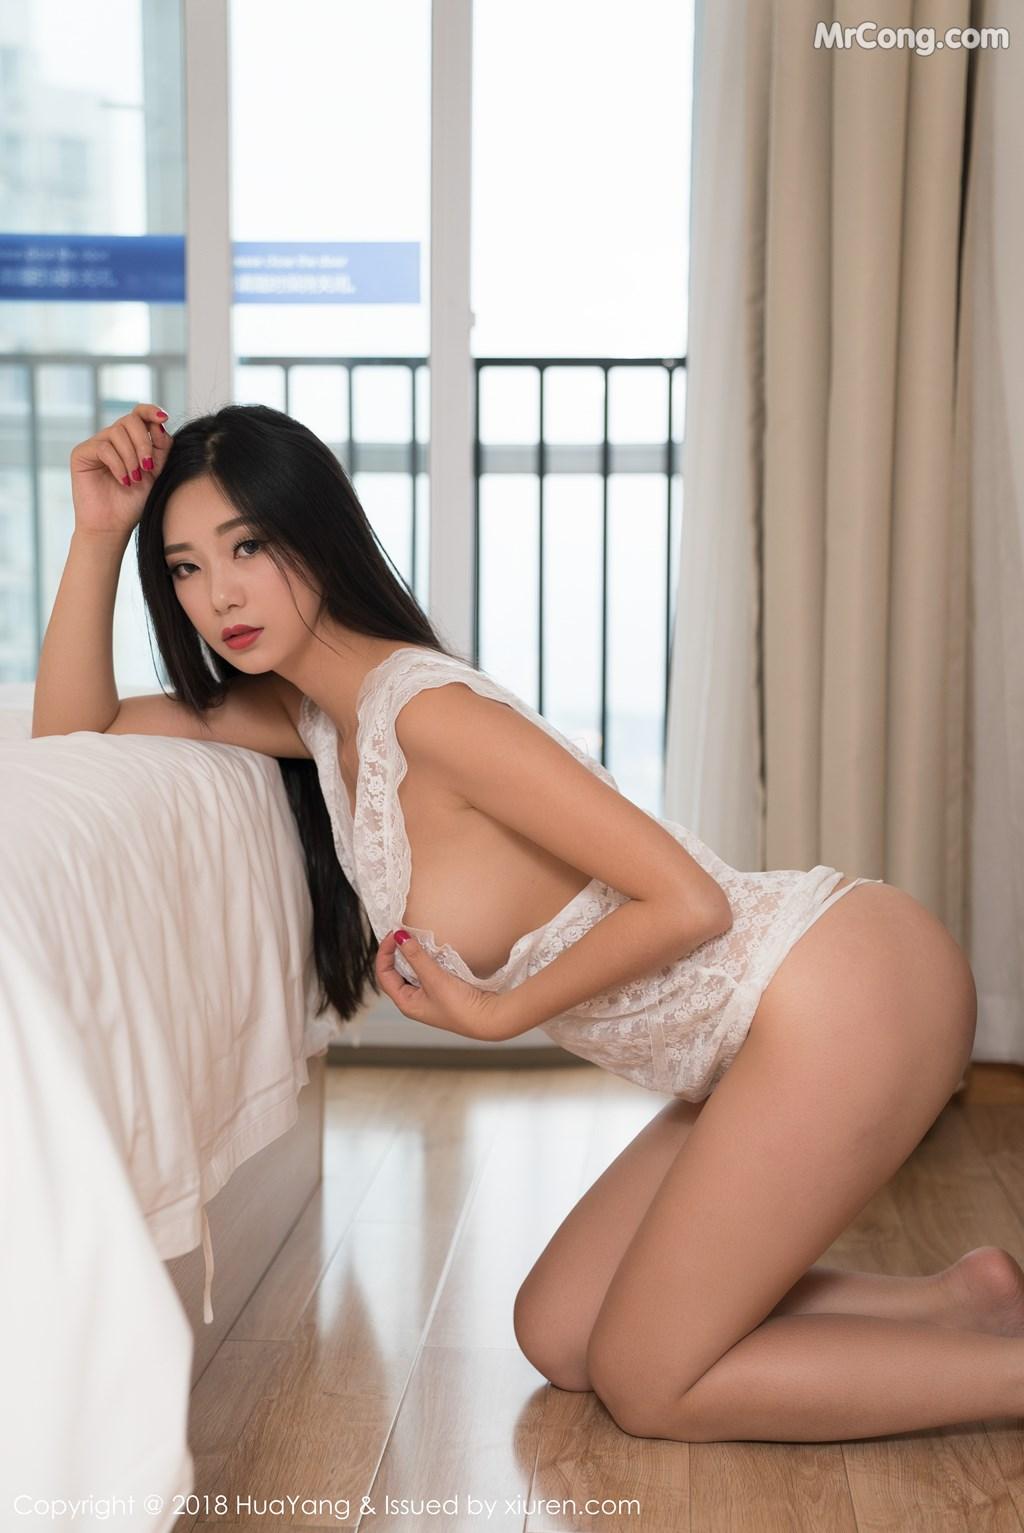 Image HuaYang-2018-02-28-Vol.033-KiKi-MrCong.com-025 in post HuaYang 2018-02-28 Vol.033: Người mẫu 宋-KiKi (42 ảnh)